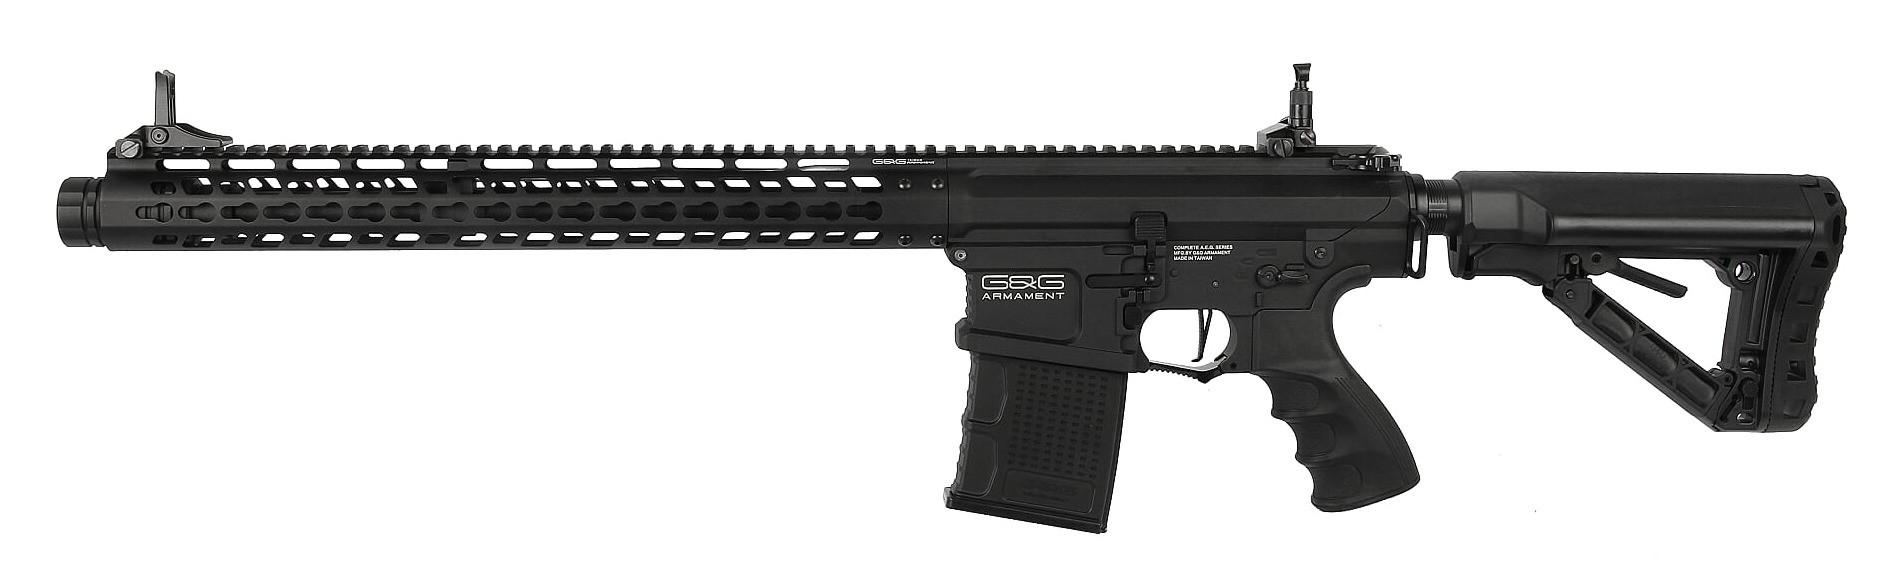 G&G - TR16 MBR 308 AEG - Noir (1 joules)